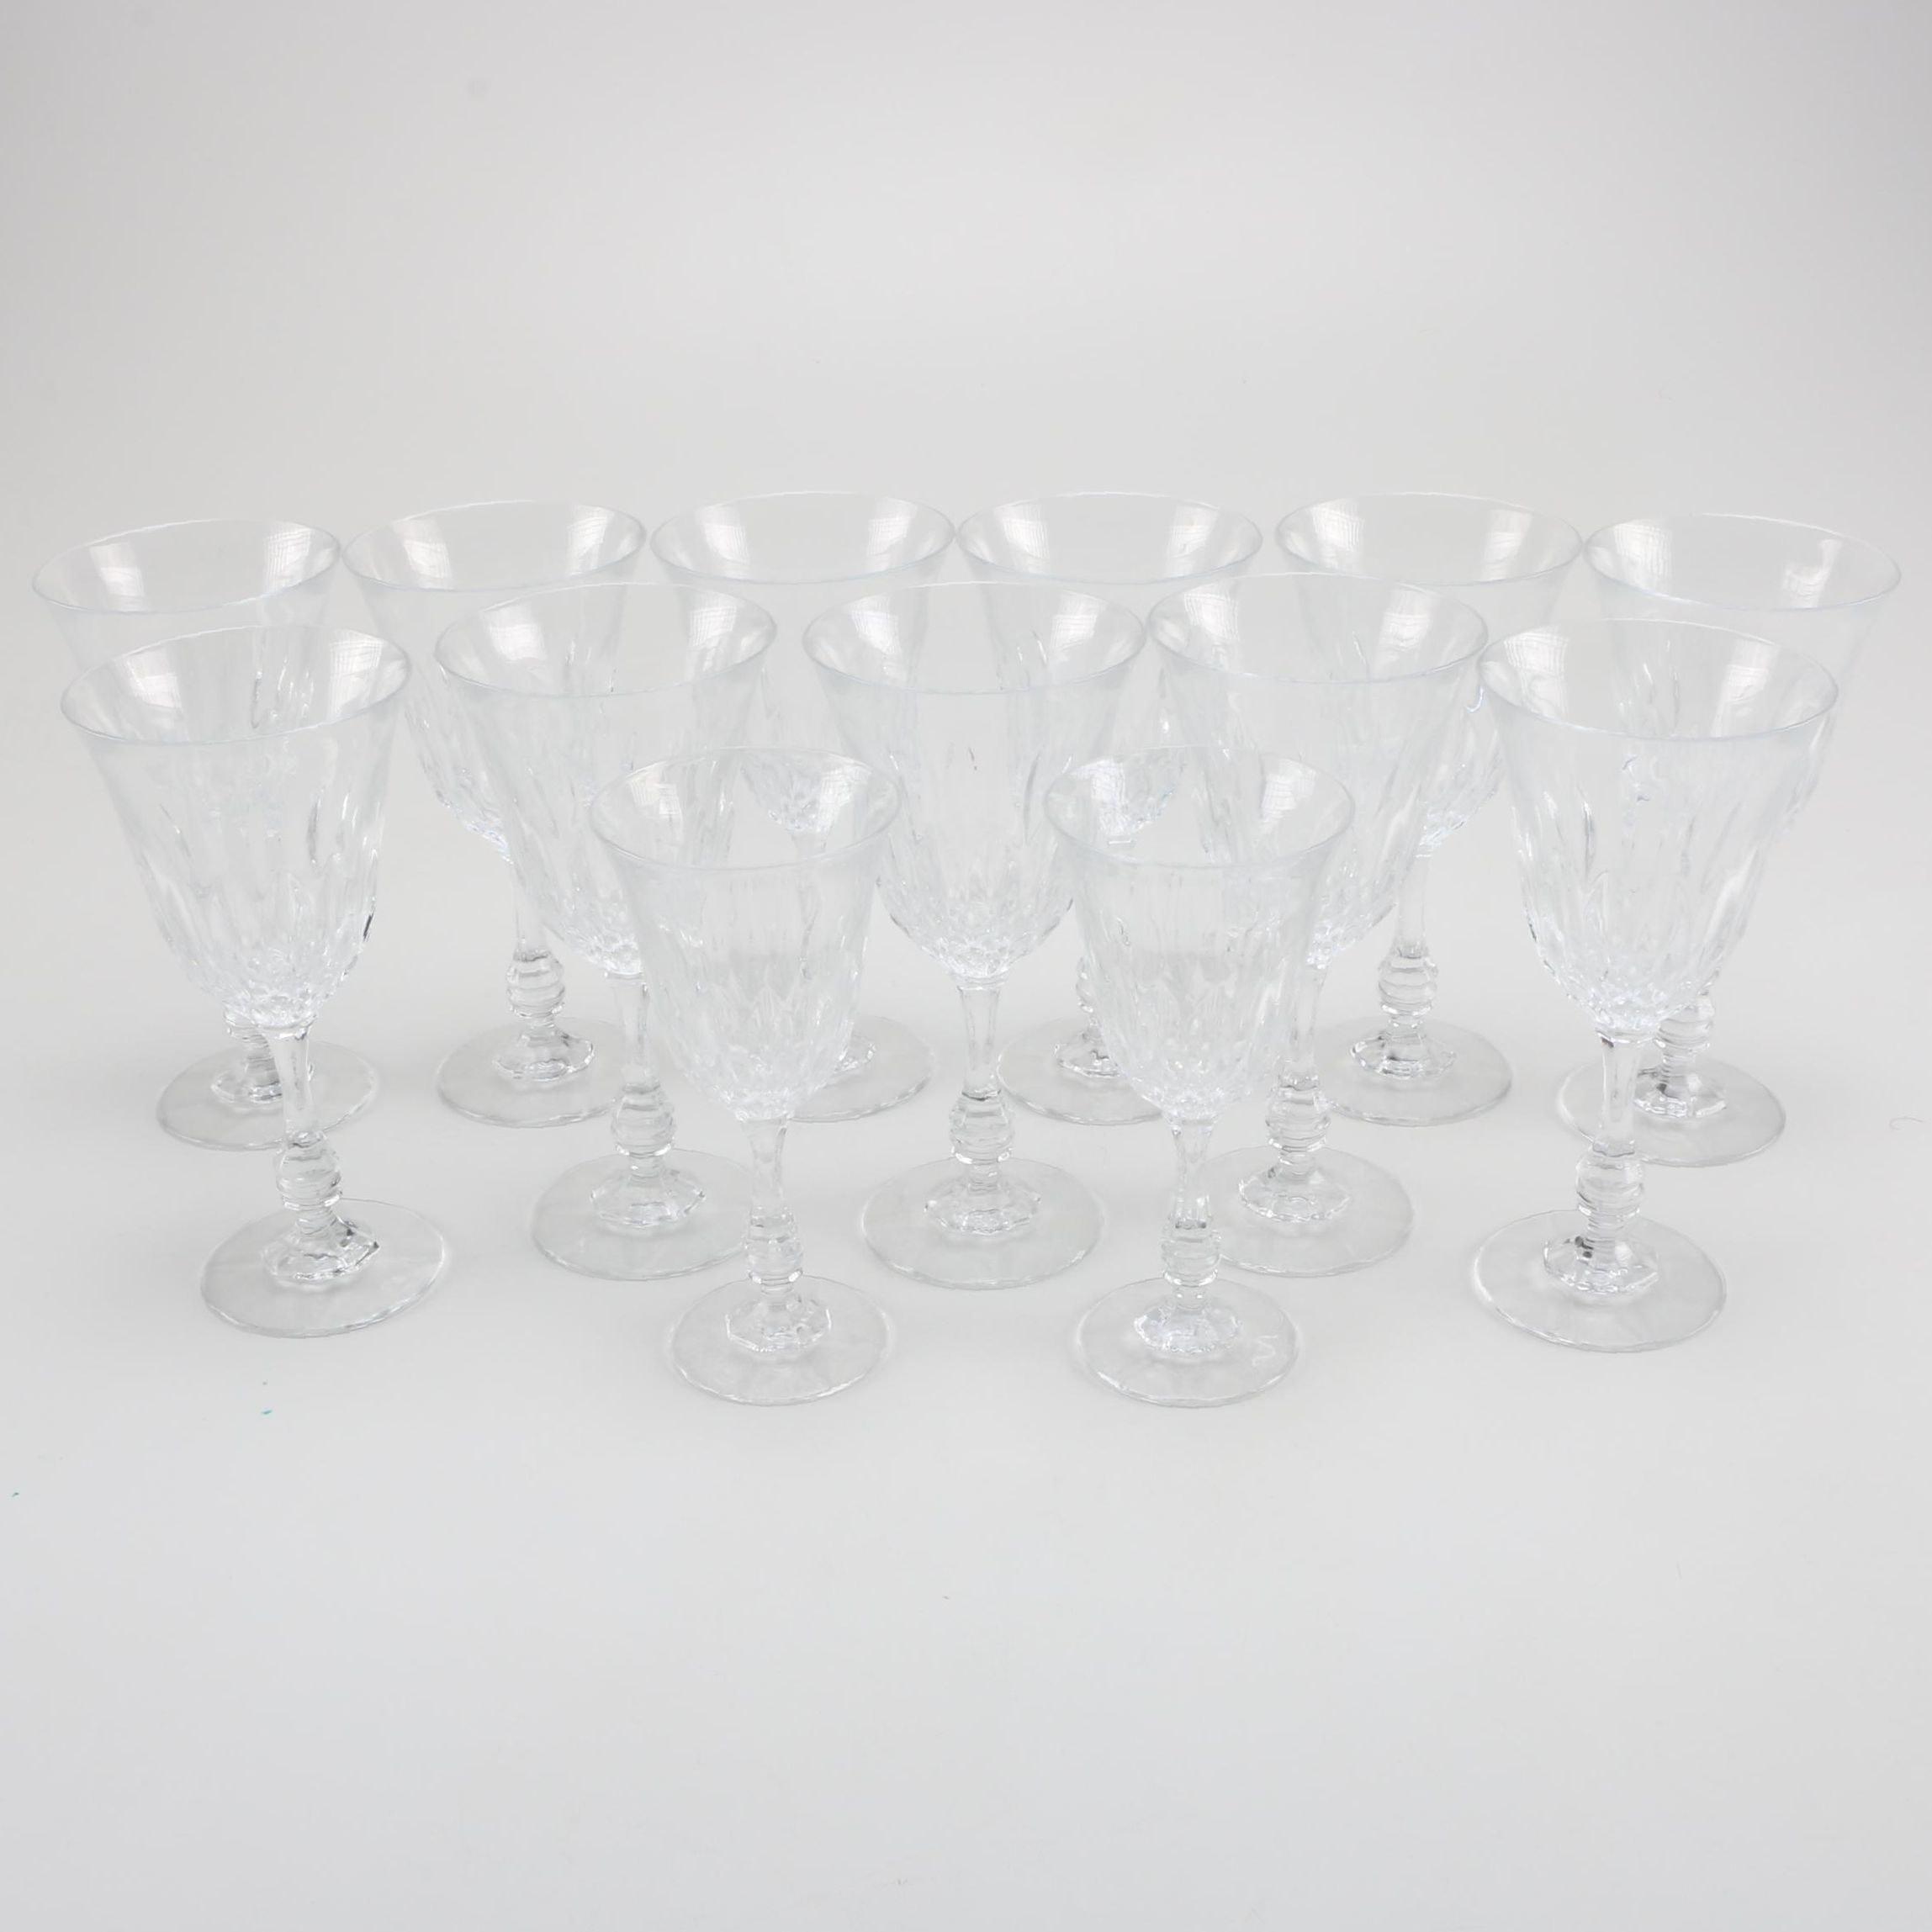 Assortment of Crystal Stemware